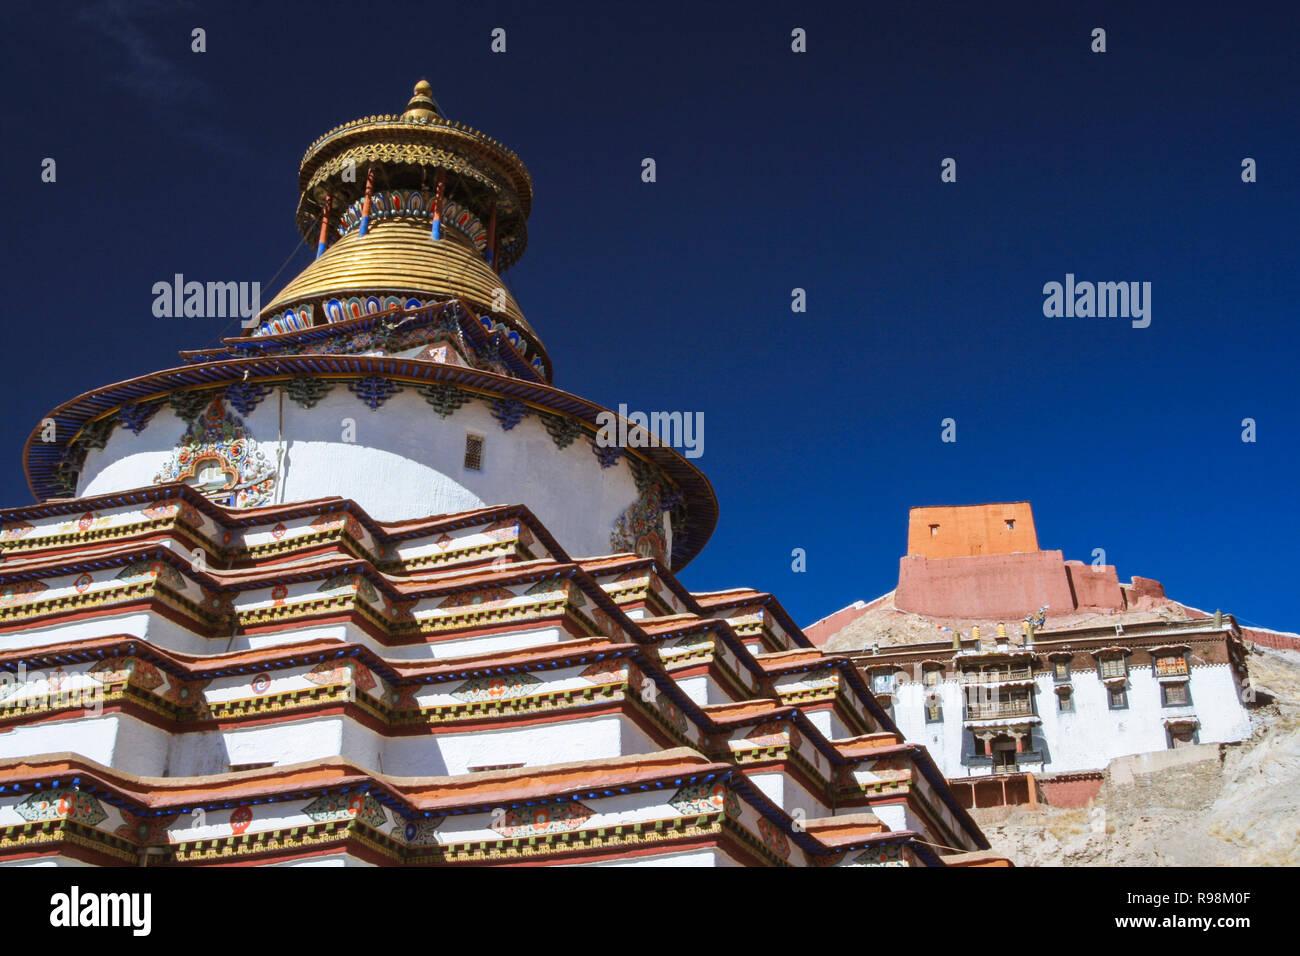 Gyantse, Shigatse Prefecture, Tibet Autonomous Region, China : Kumbum of Gyantse within Palcho Monastery or Pelkor Chode Monastery. The Kumbum, the bi - Stock Image